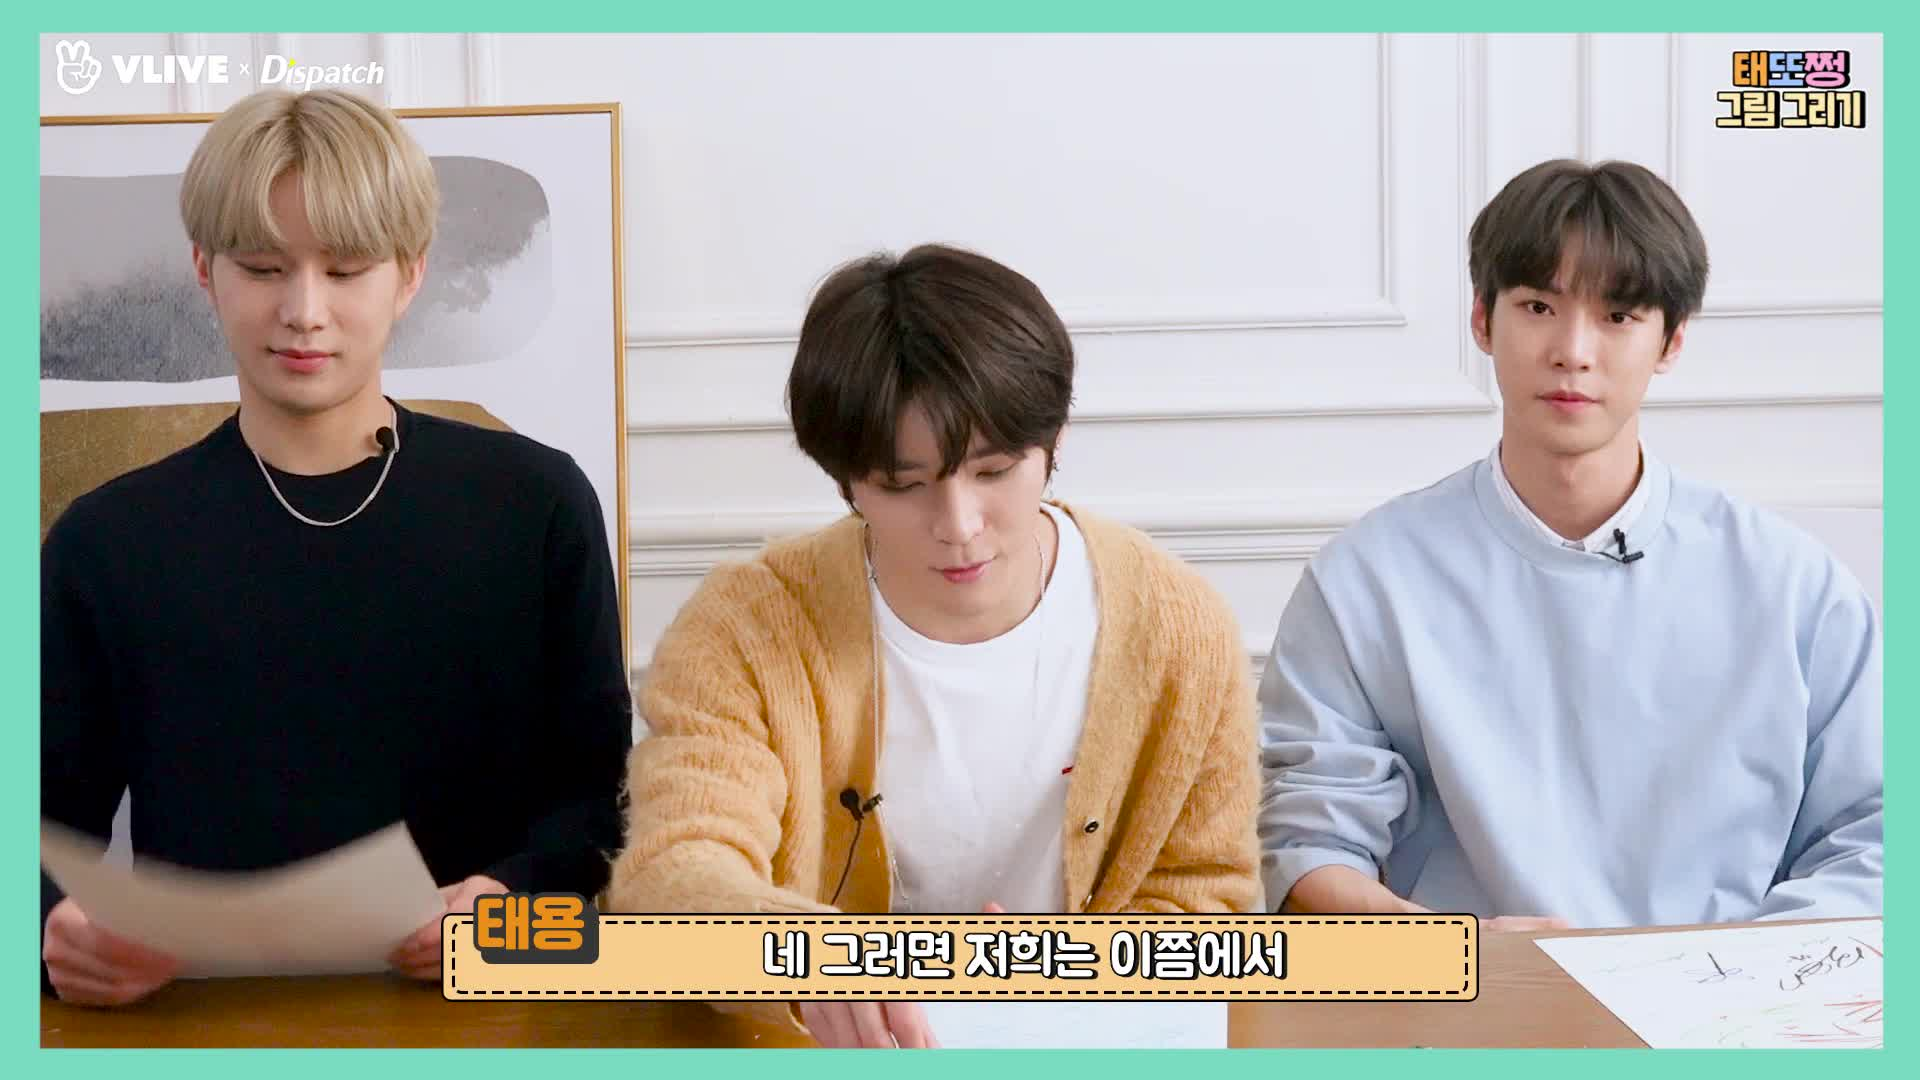 "[ⓓxV] ""세계 3대 화가는 바로!"" (태용, 도영, 정우 : NCT)"